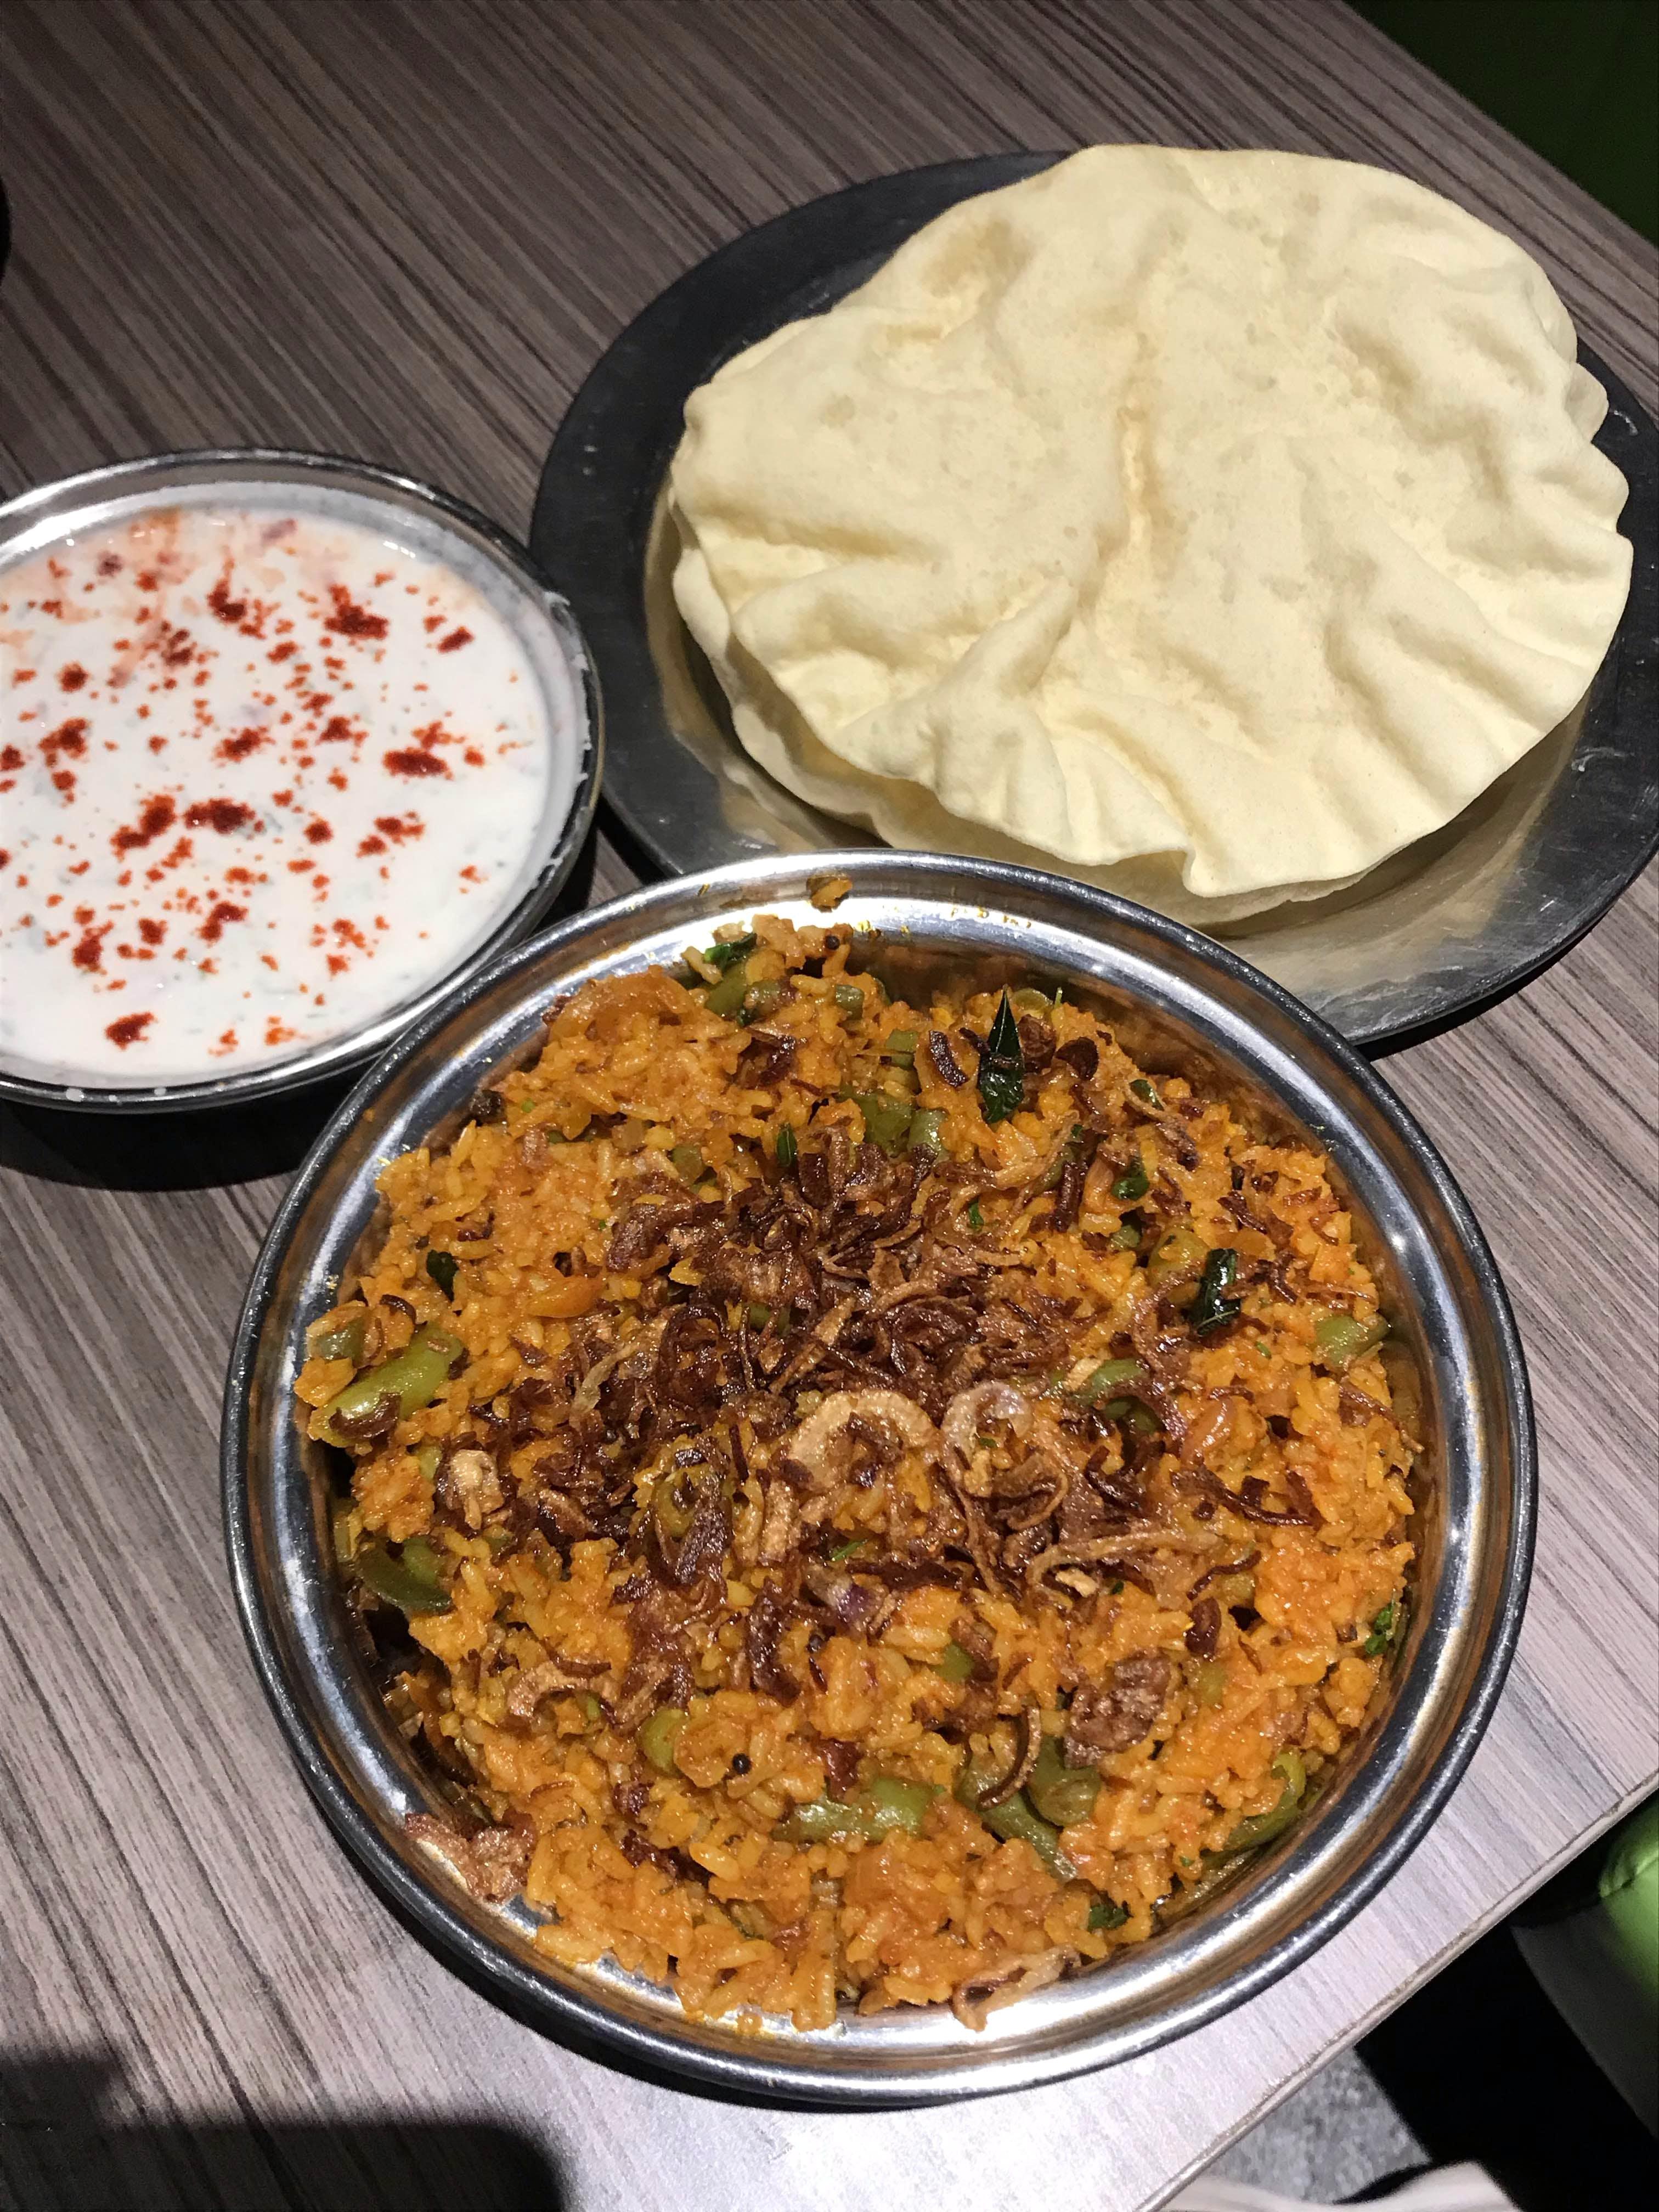 Dish,Food,Cuisine,Ingredient,Recipe,Indian cuisine,Produce,Sindhi cuisine,Meal,Masala